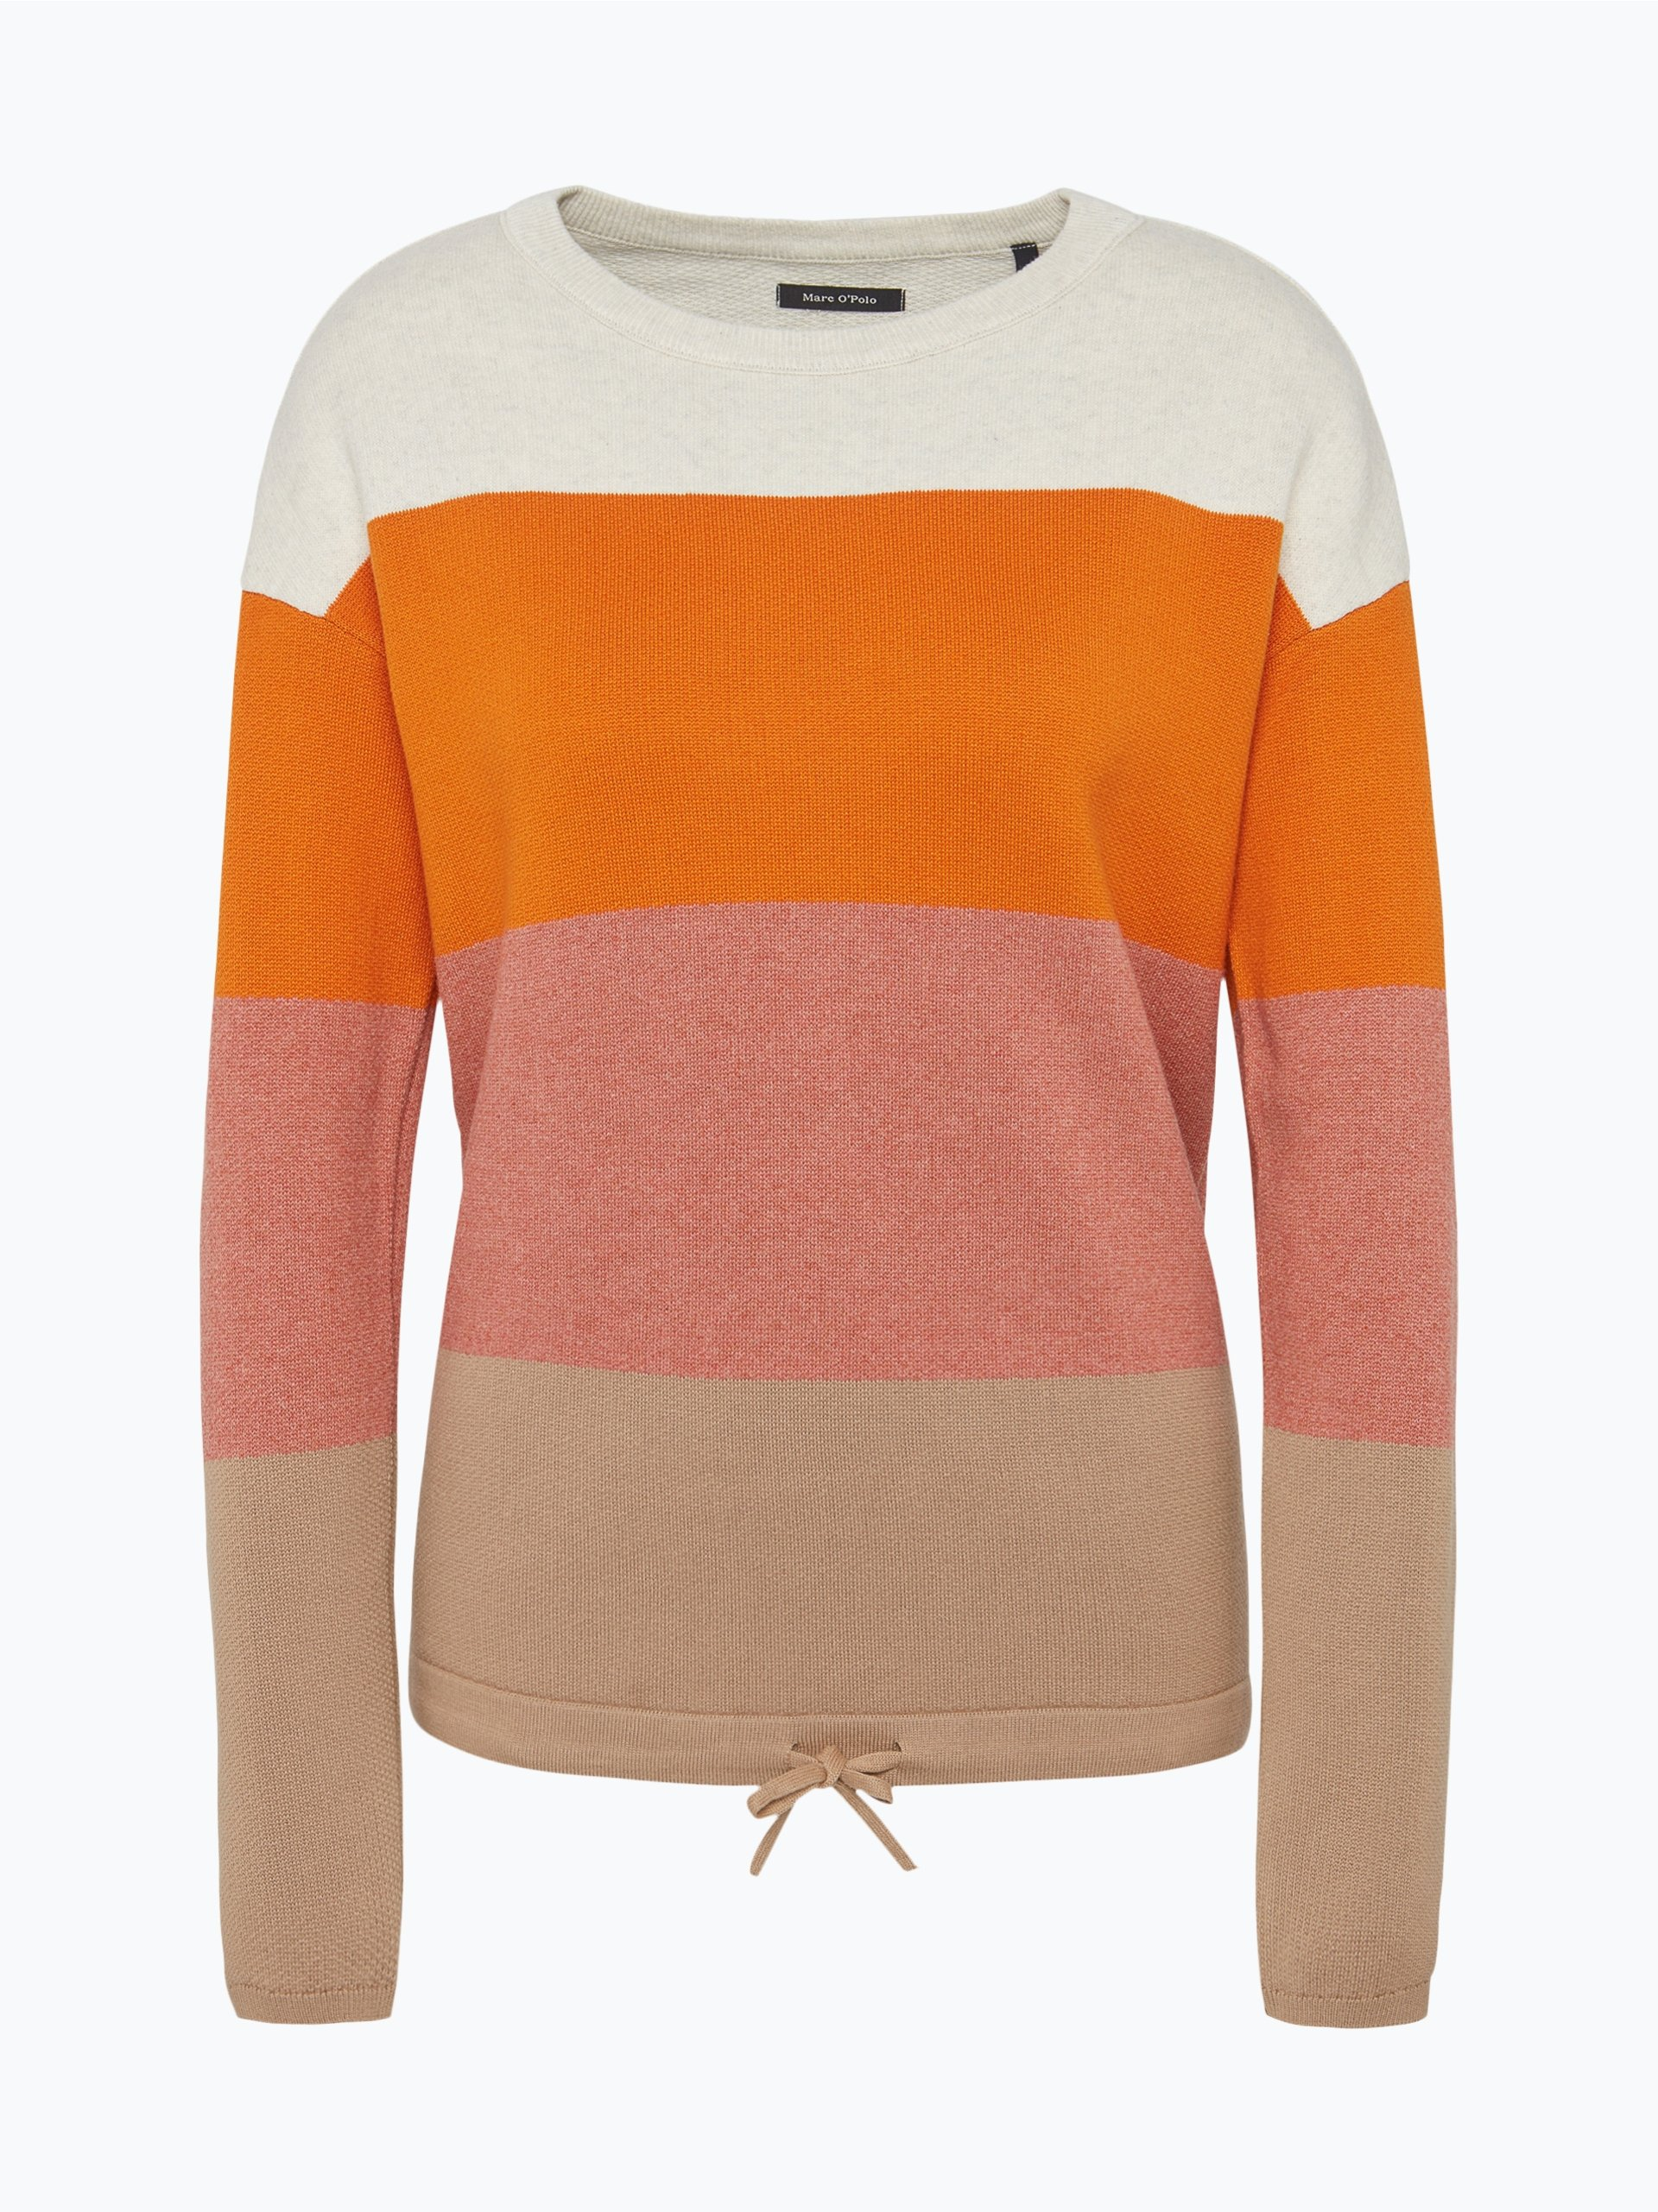 marc o 39 polo damen pullover orange gestreift online kaufen. Black Bedroom Furniture Sets. Home Design Ideas